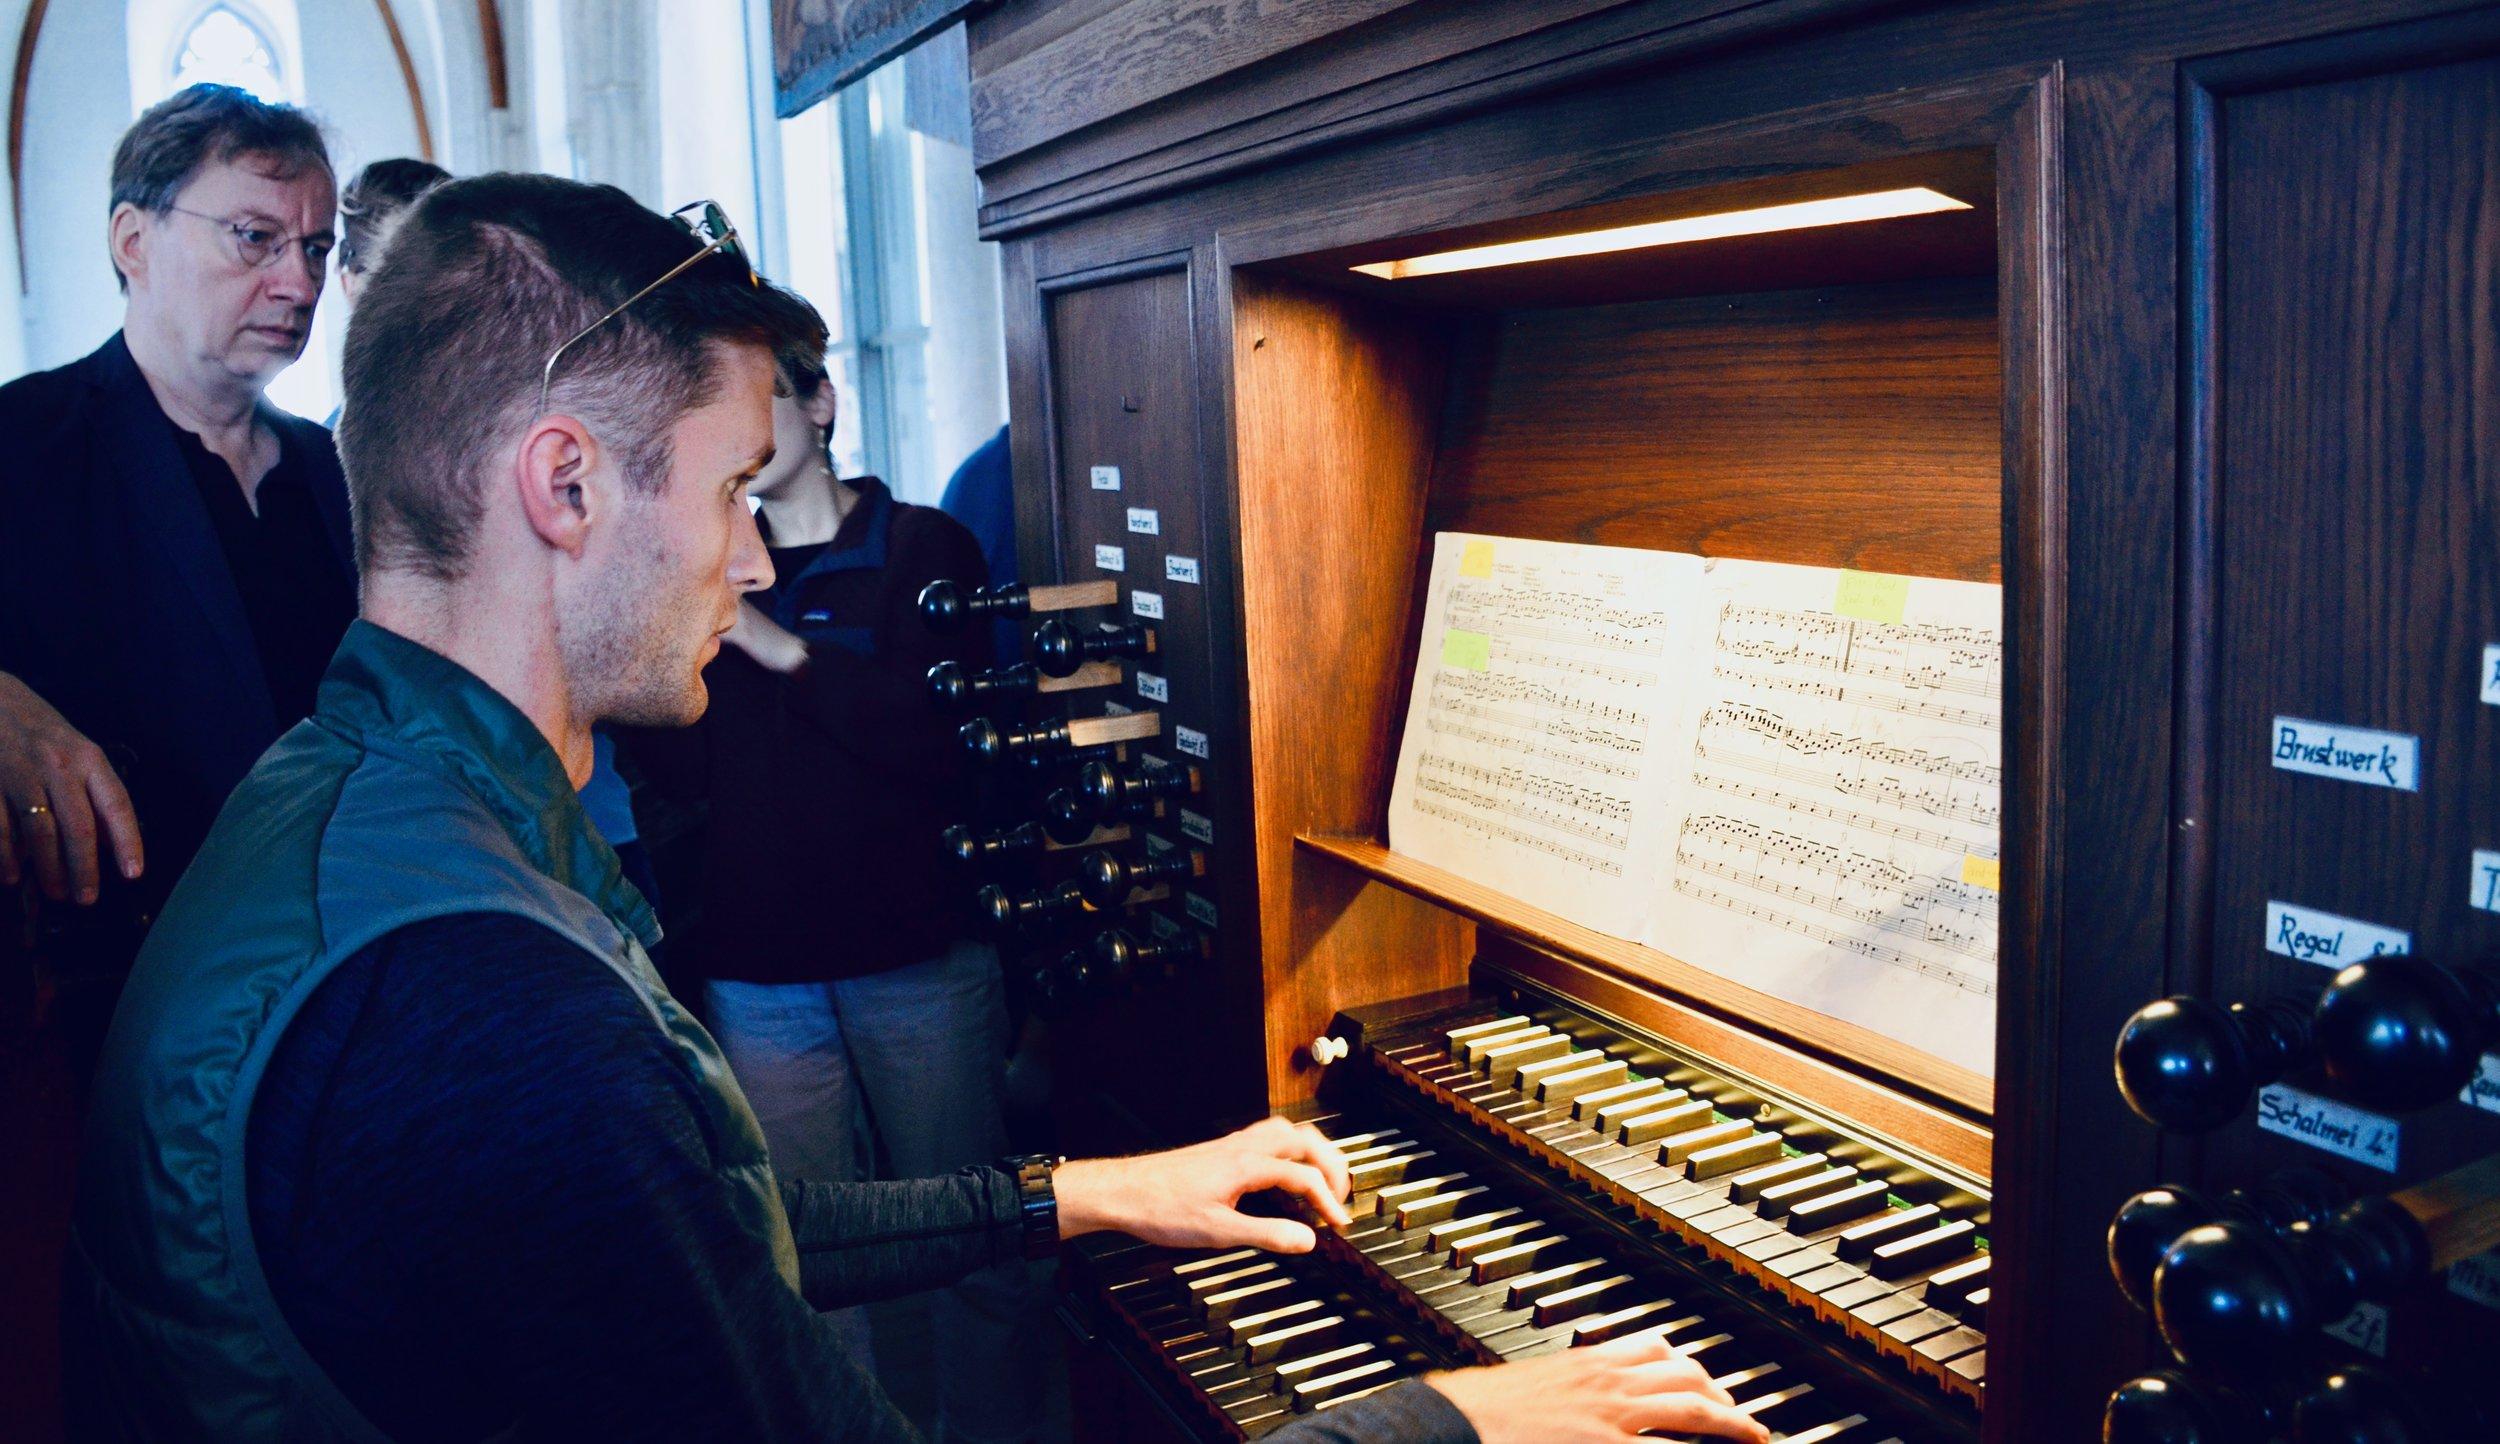 Evan Curries plays the 1637 Stellwagen Organ, St. Jakobi, Lübeck.